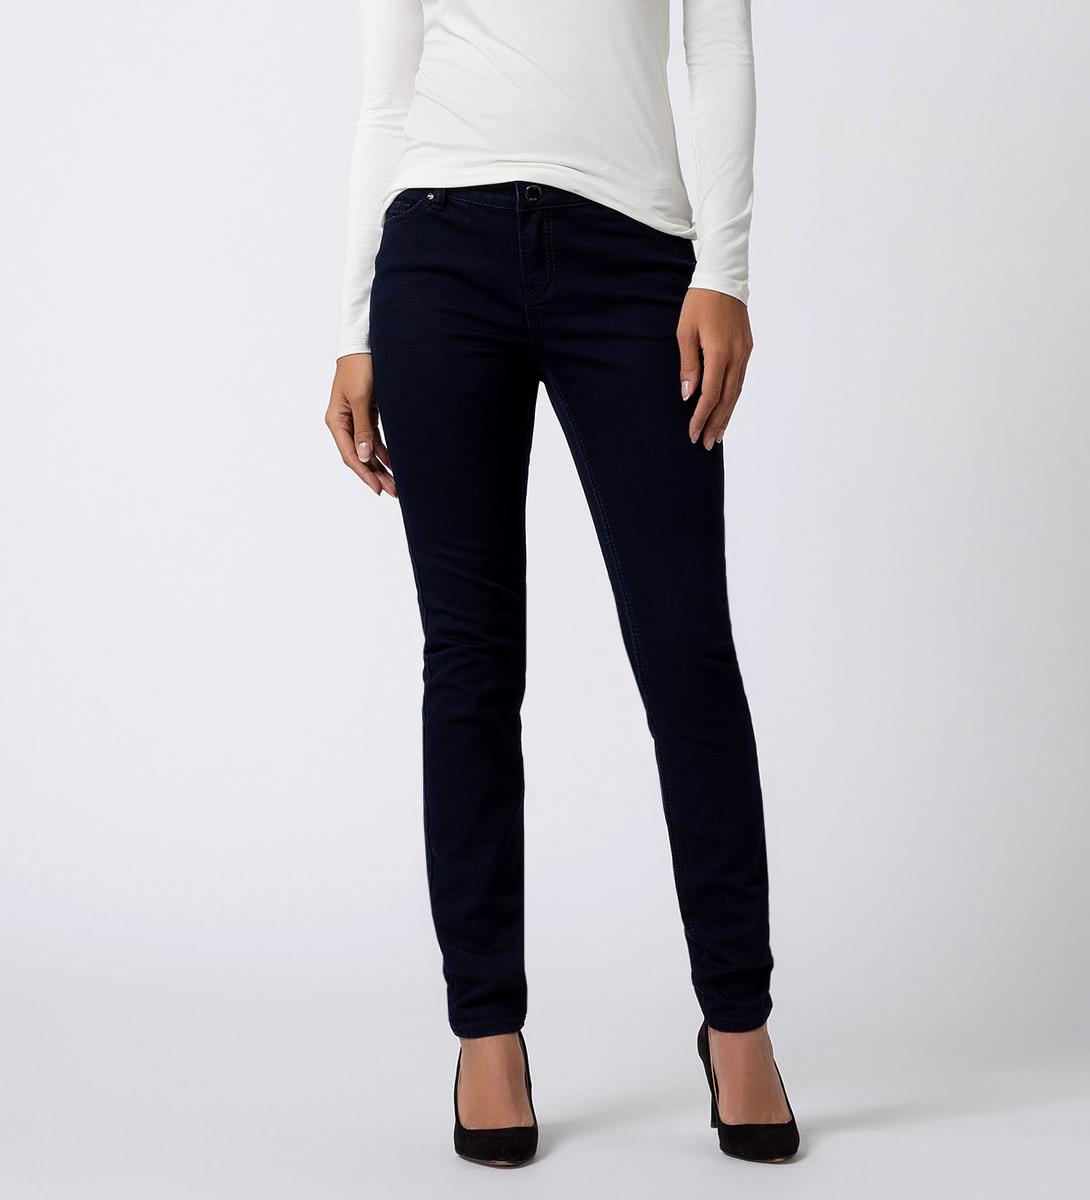 Jeans Padua 32 Inch dark blue clean